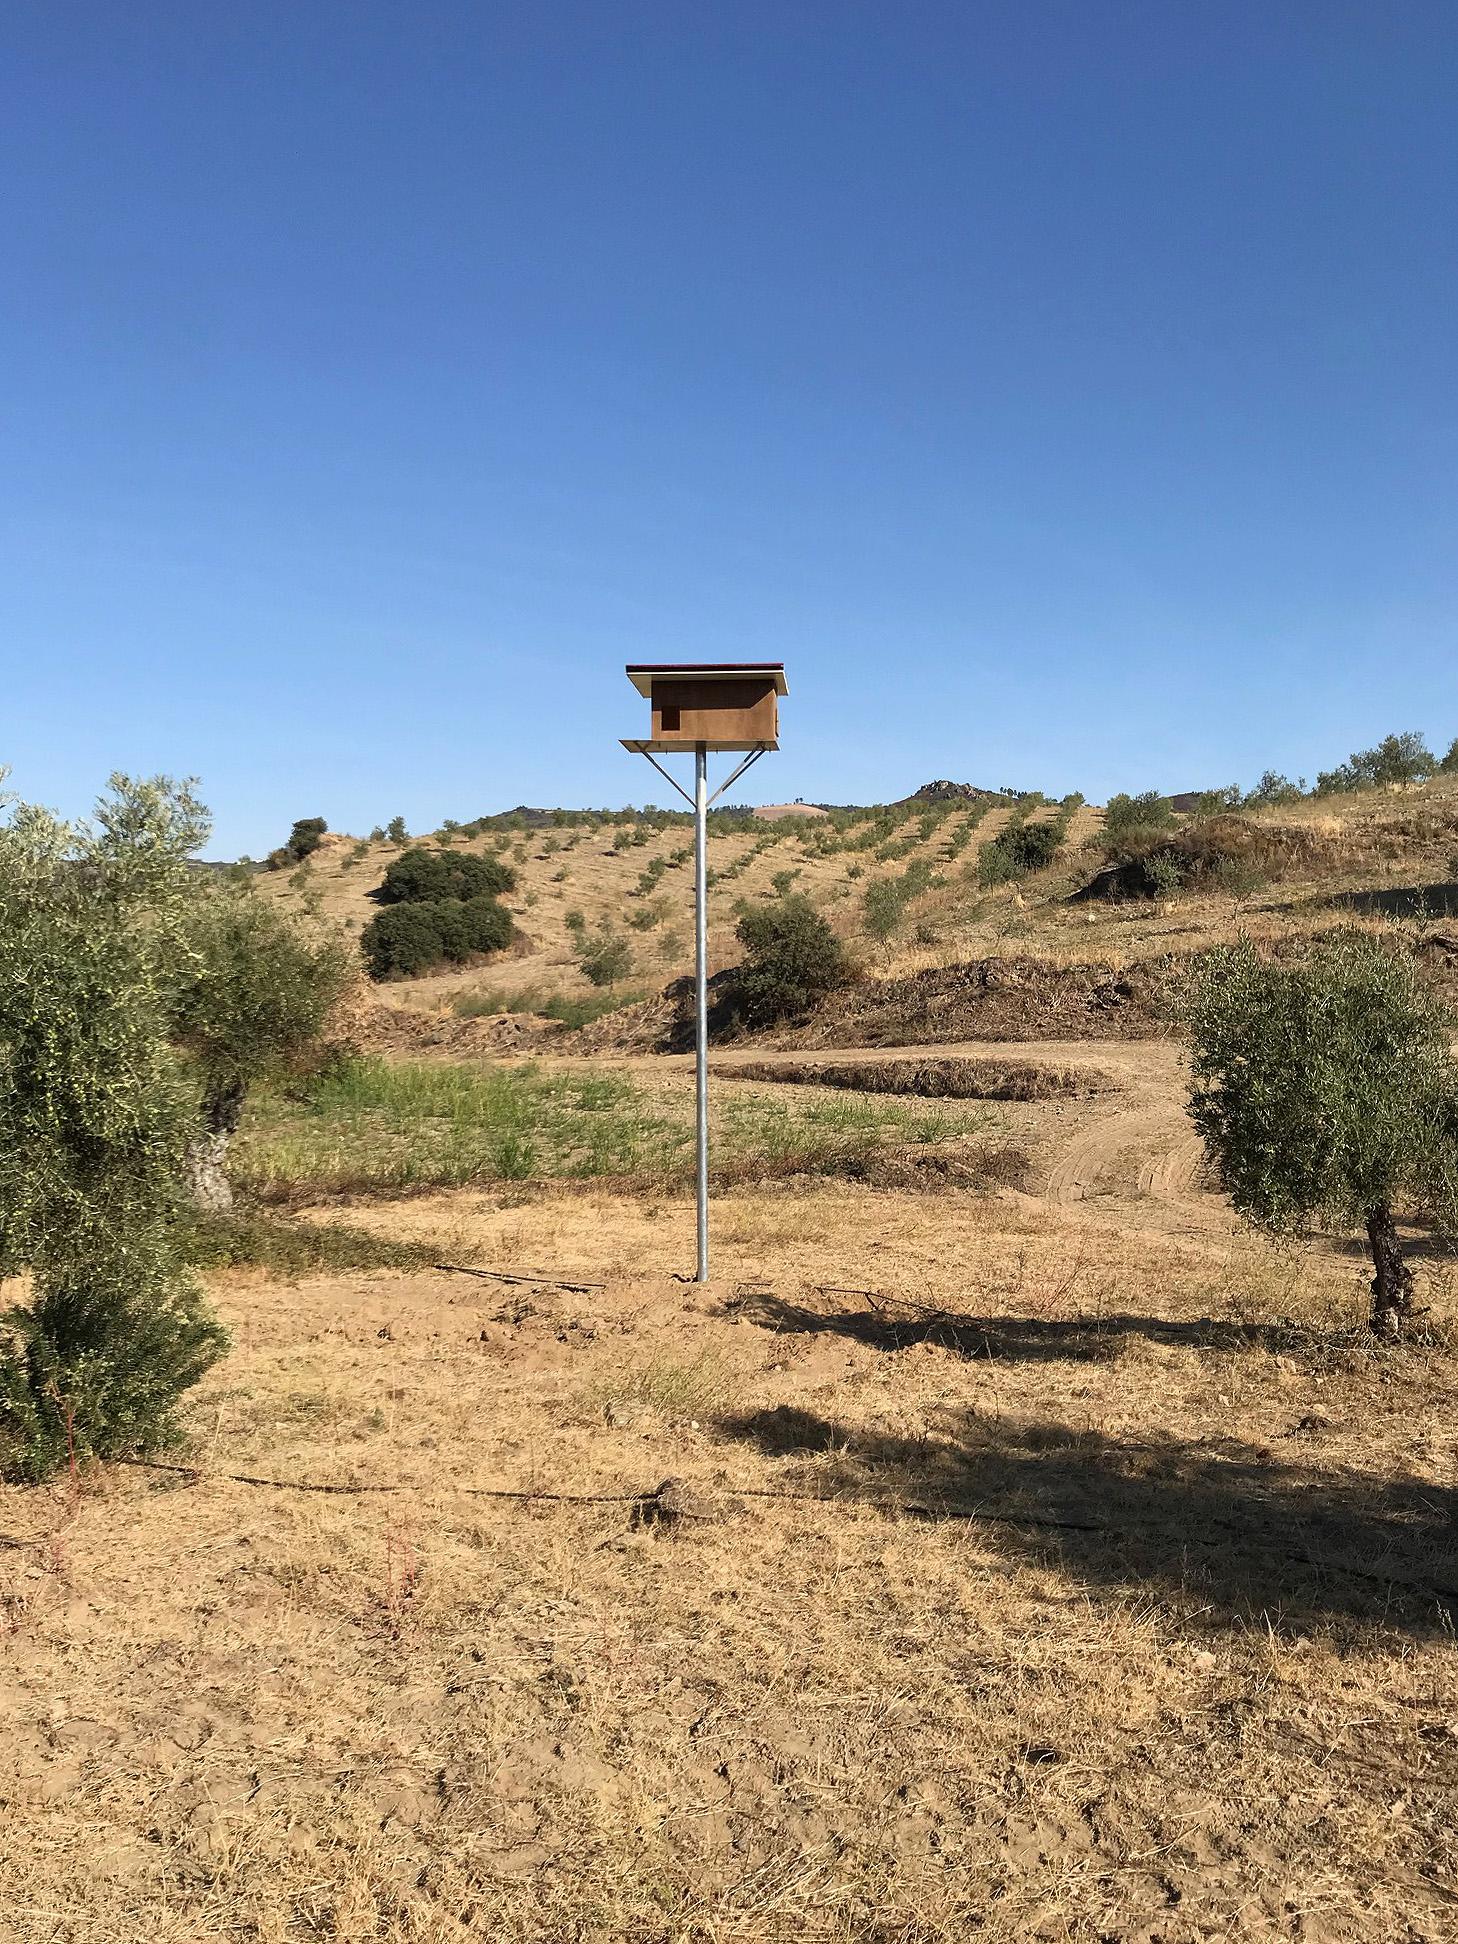 Caixa ninho para coruja das torres (Tyto alba)